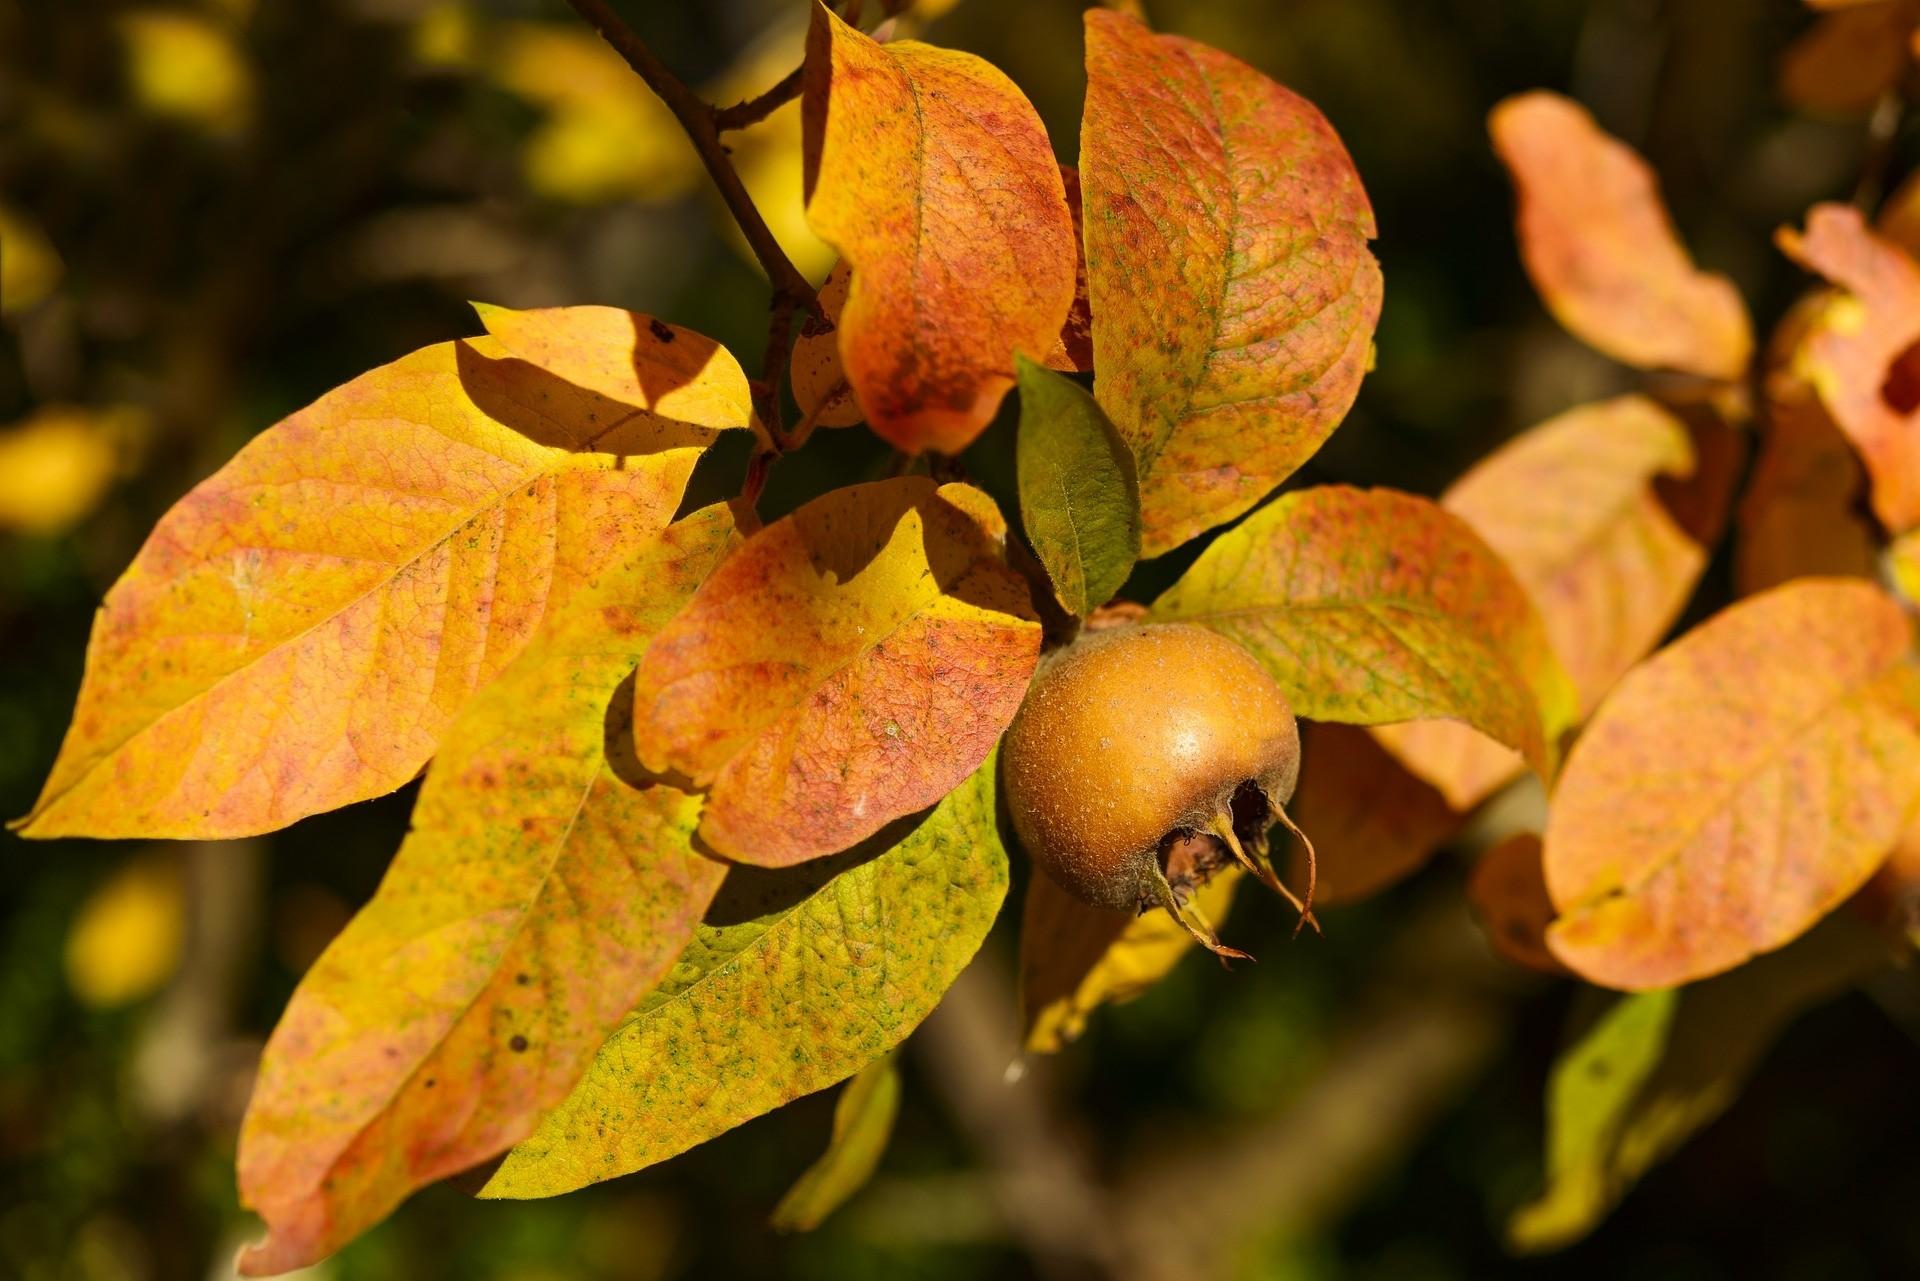 Vruchtensmaak en herfstkleur - De Tuinen van Appeltern